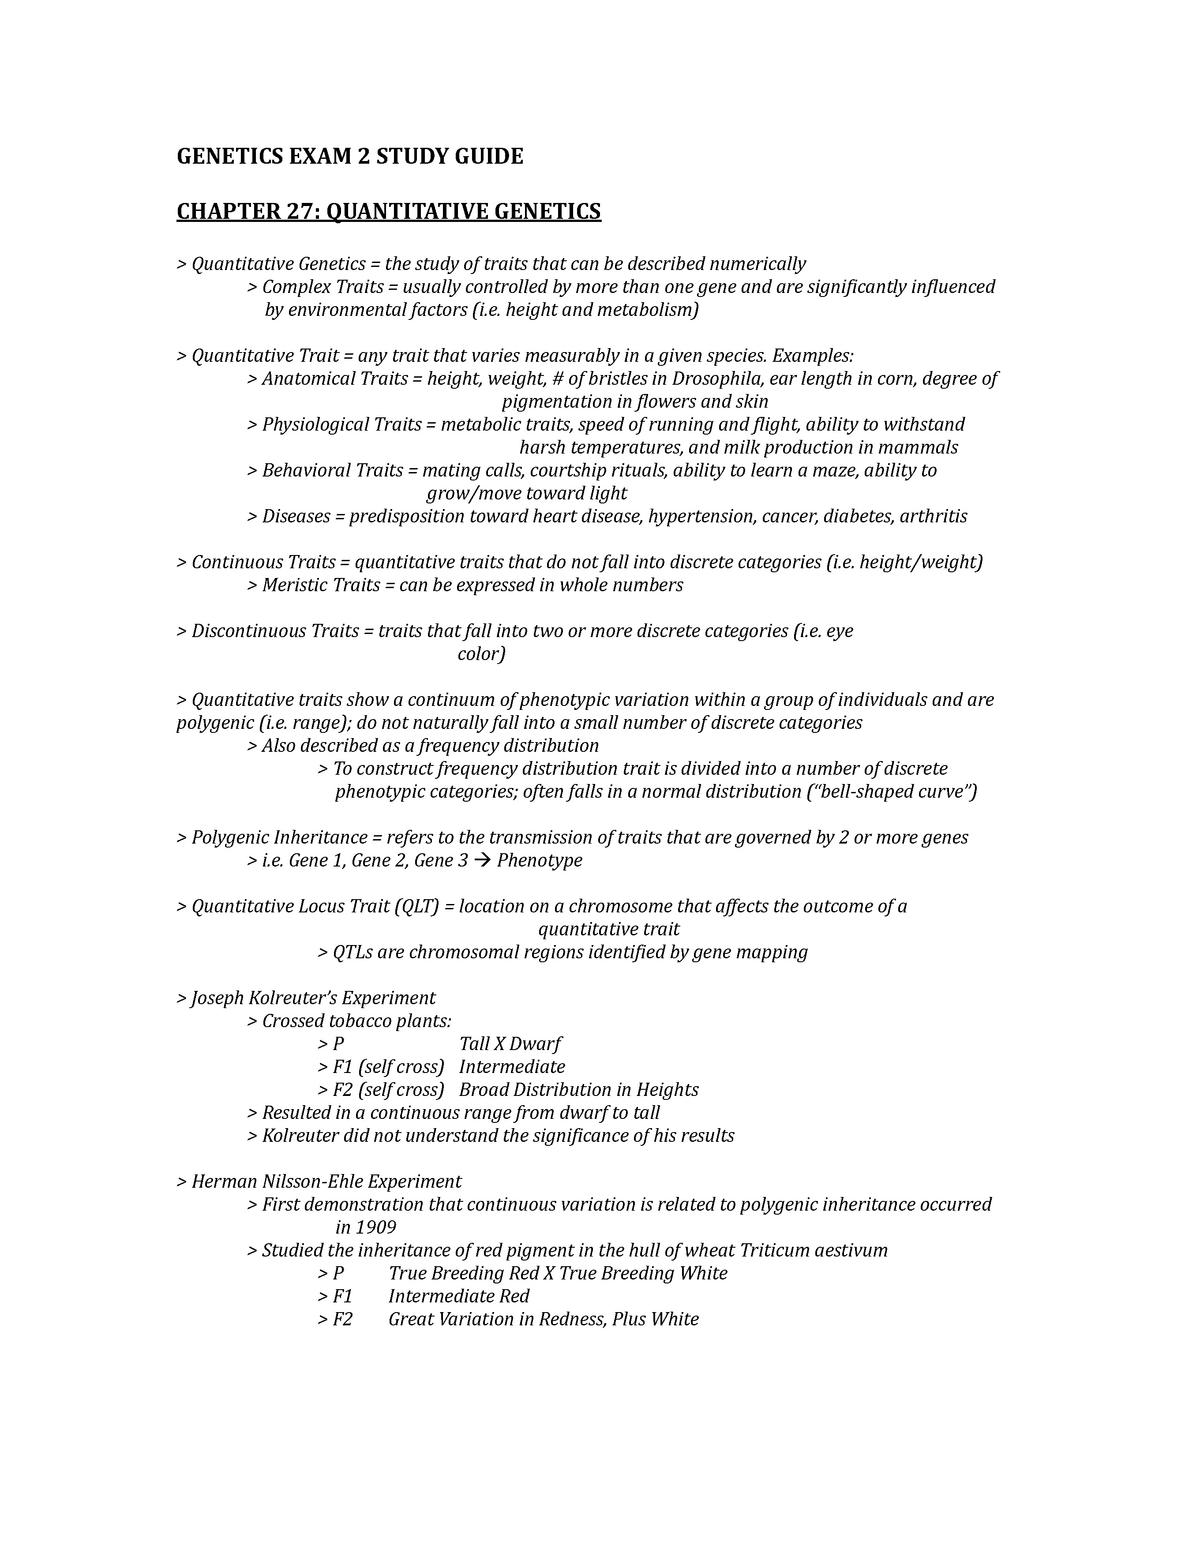 Study Genes Dwarf Environment In >> Genetics Exam 2 Study Guide Pcb3063 General Genetics Studocu